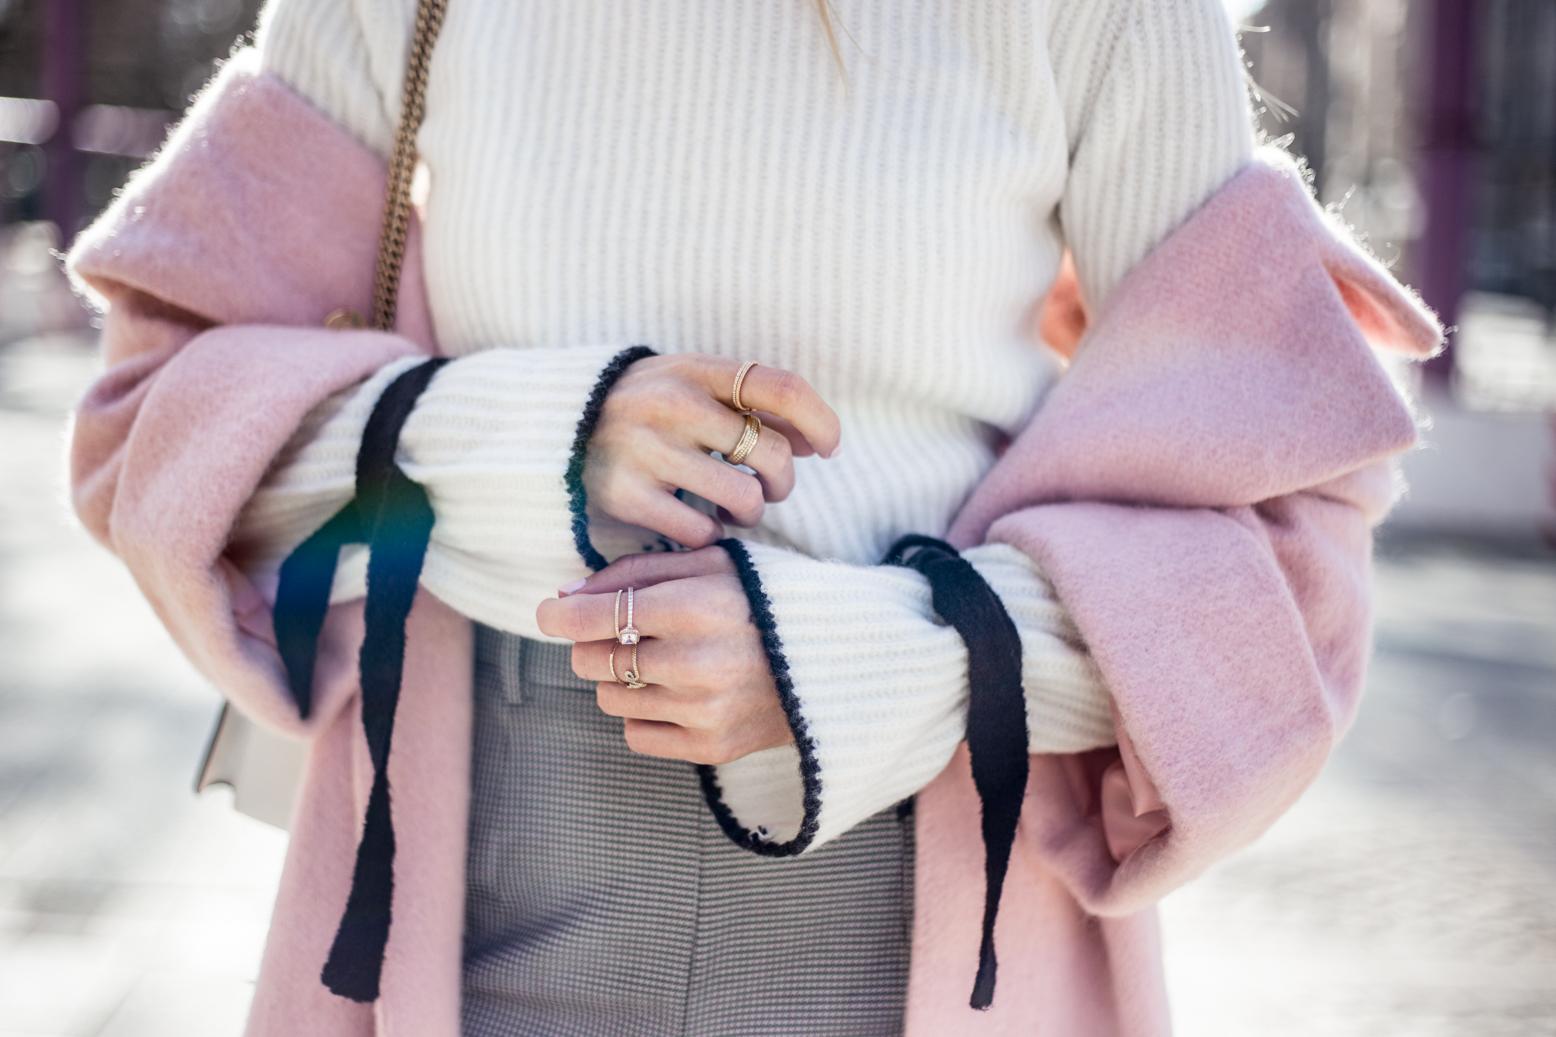 pink-coat-gucci-slipper-livia-auer-1738